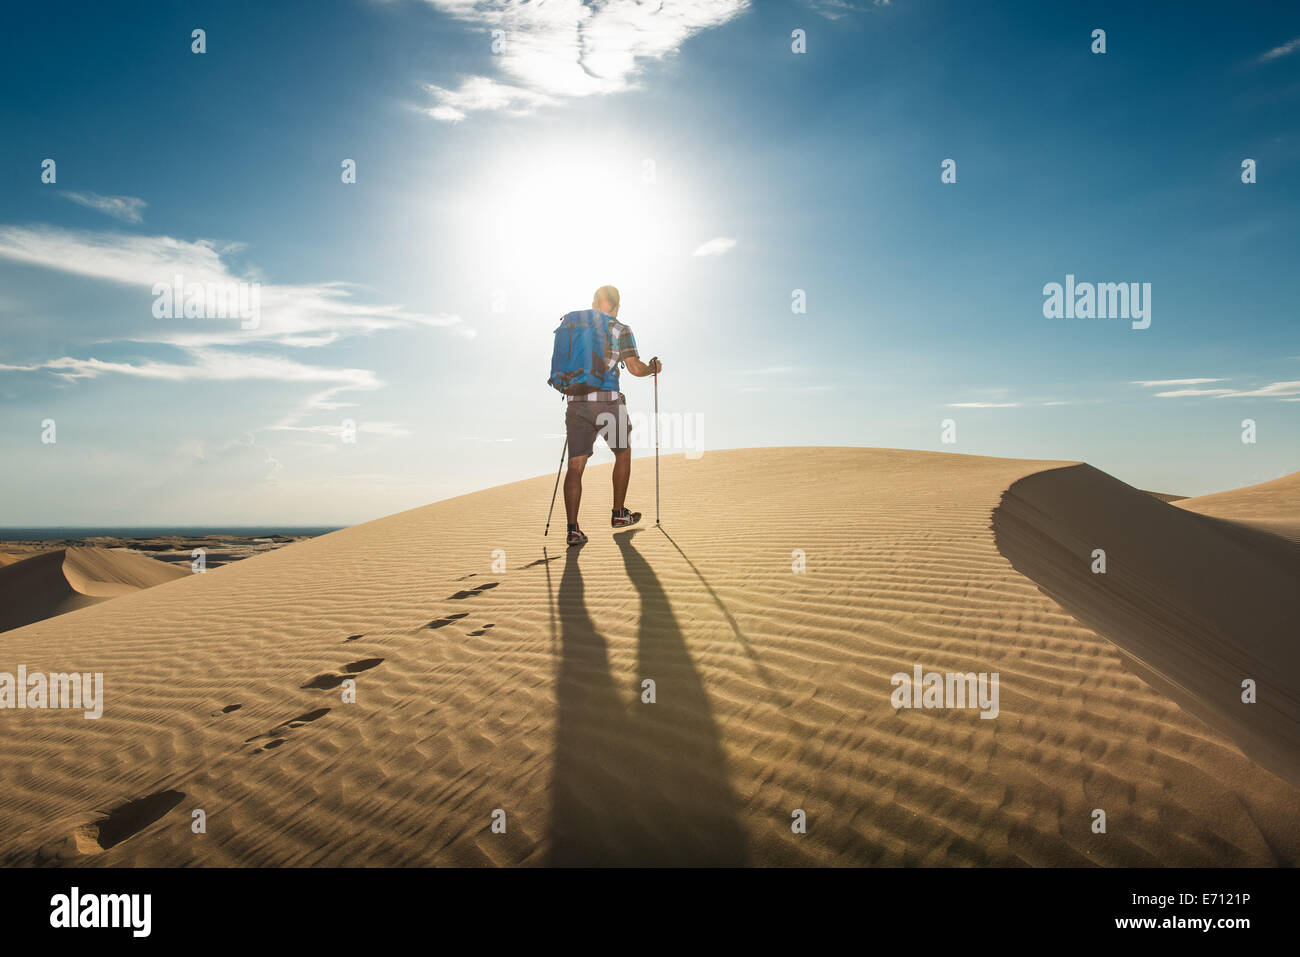 Man hiking in Glamis sand dunes, California, USA - Stock Image